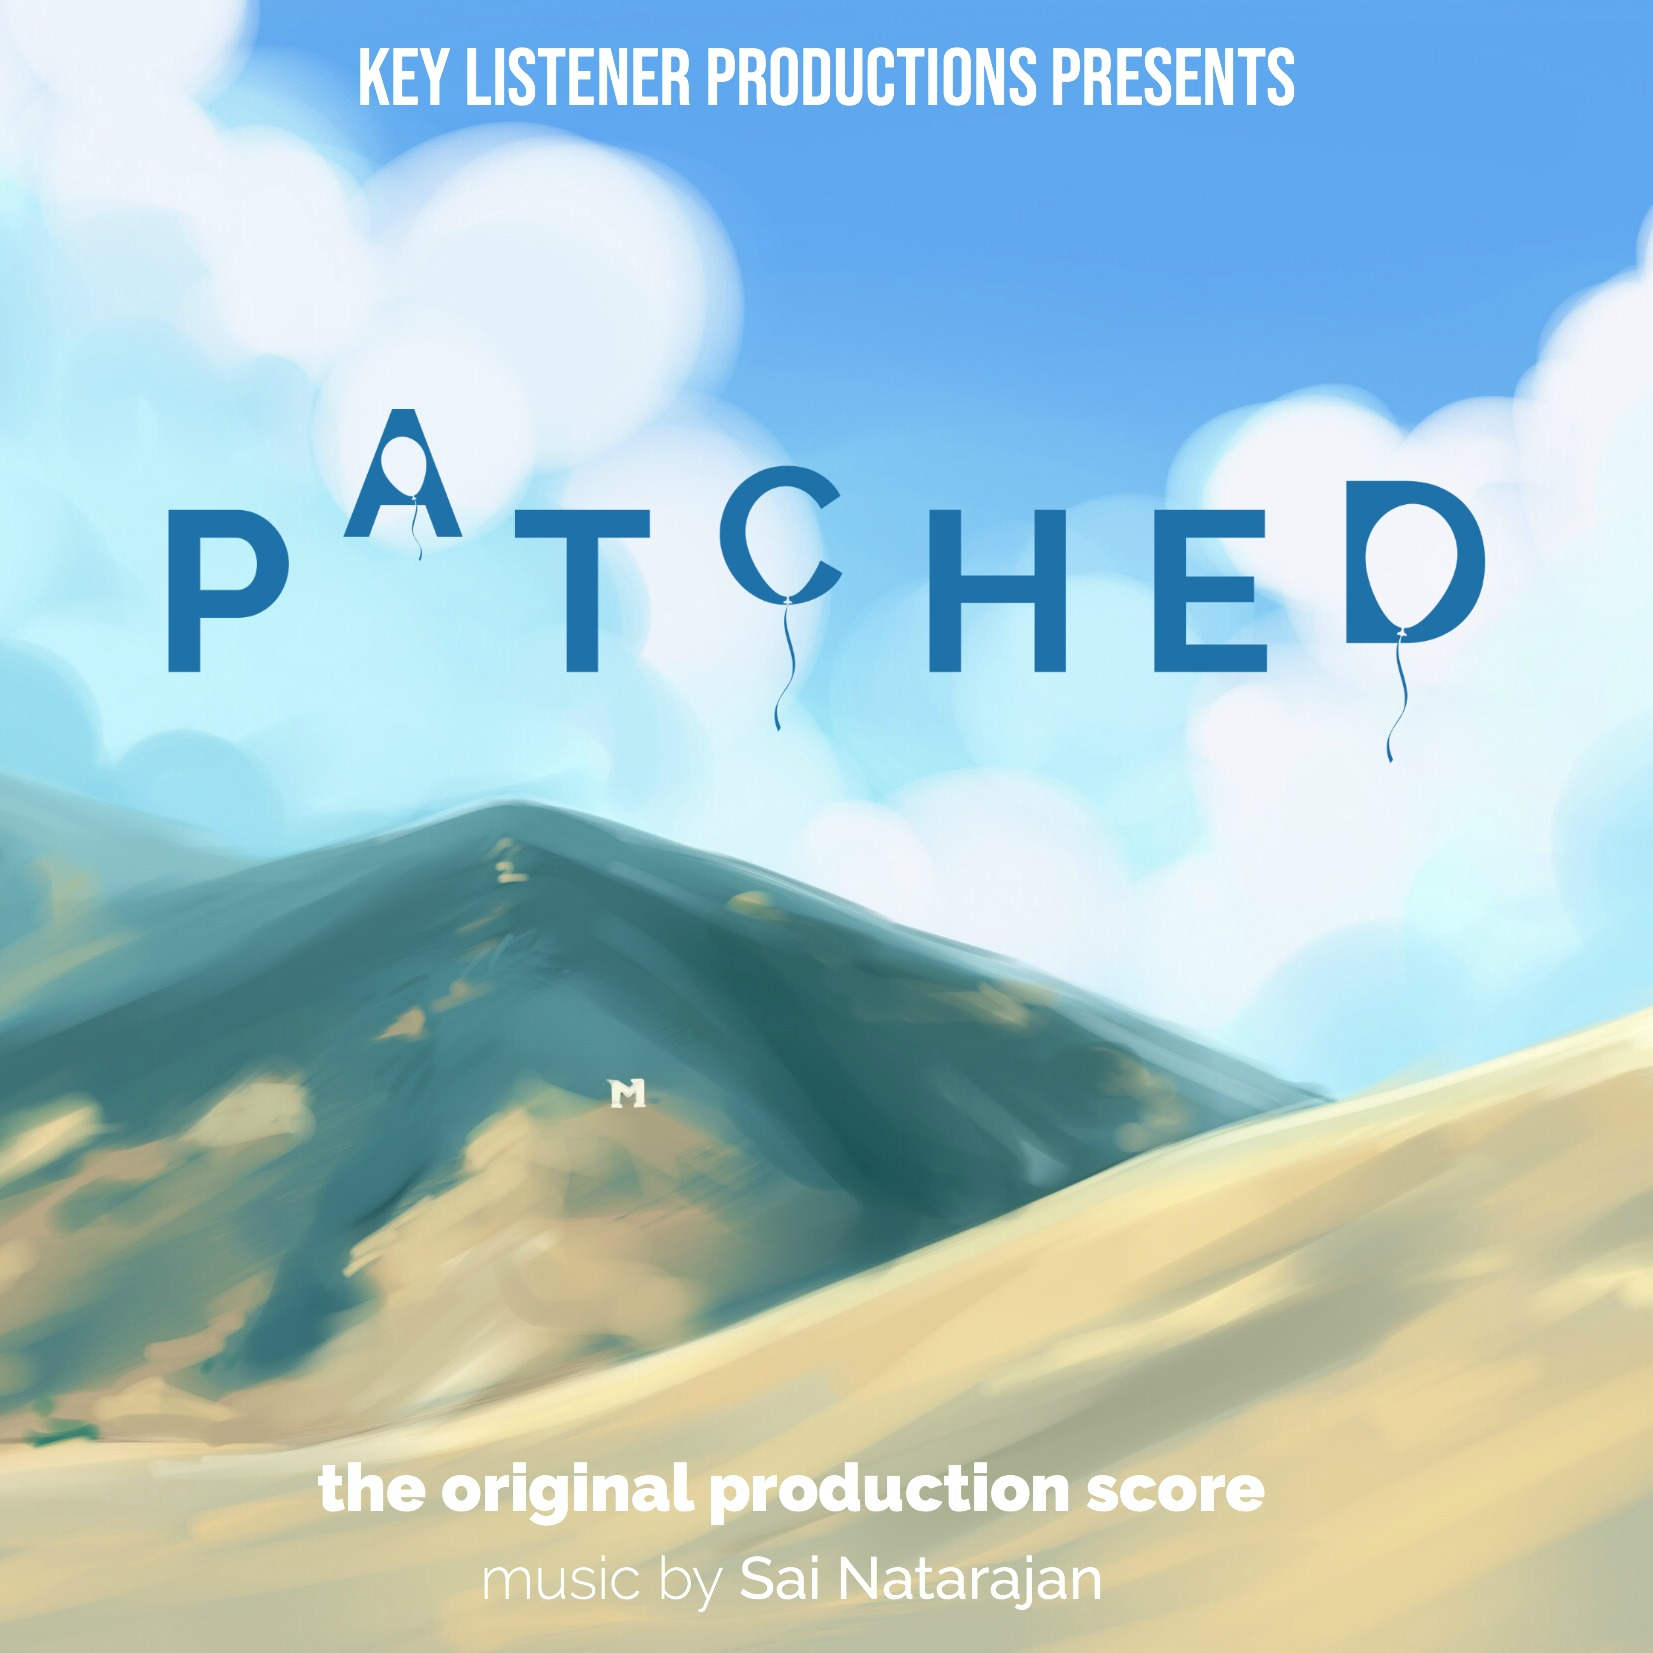 Patched Score Album Art.jpg